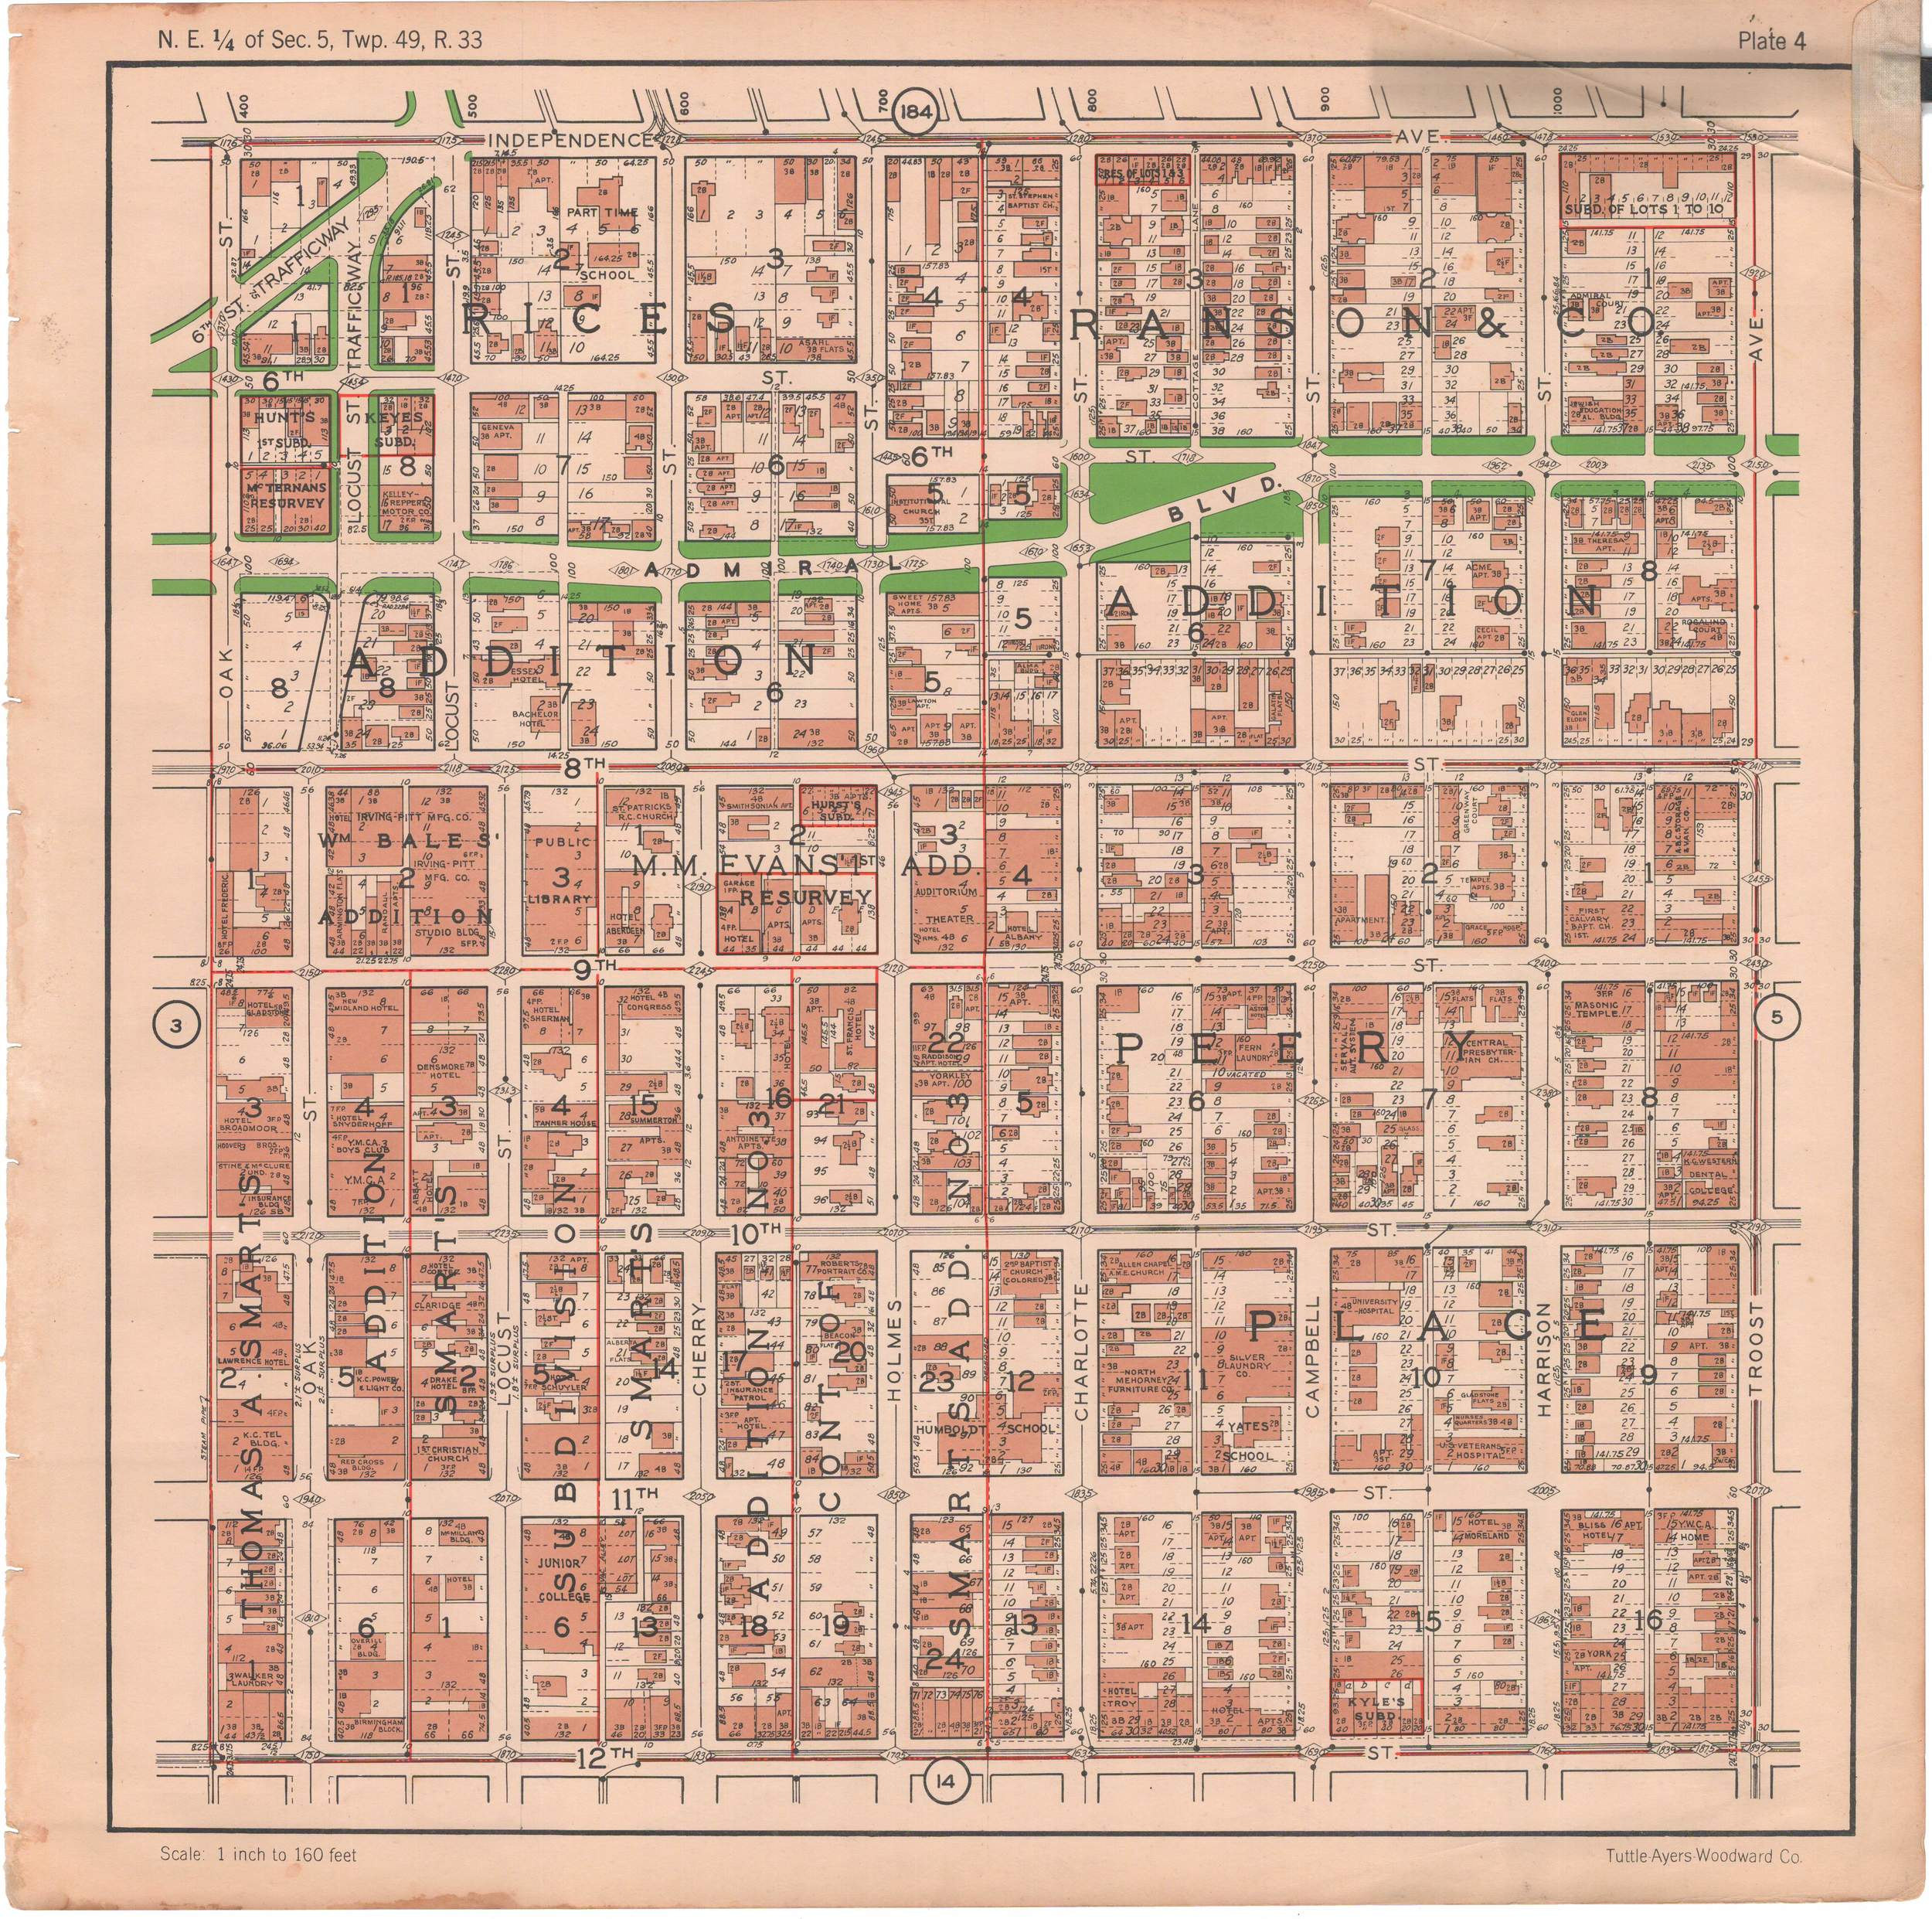 1925 TUTTLE_AYERS_Plate 4.JPG